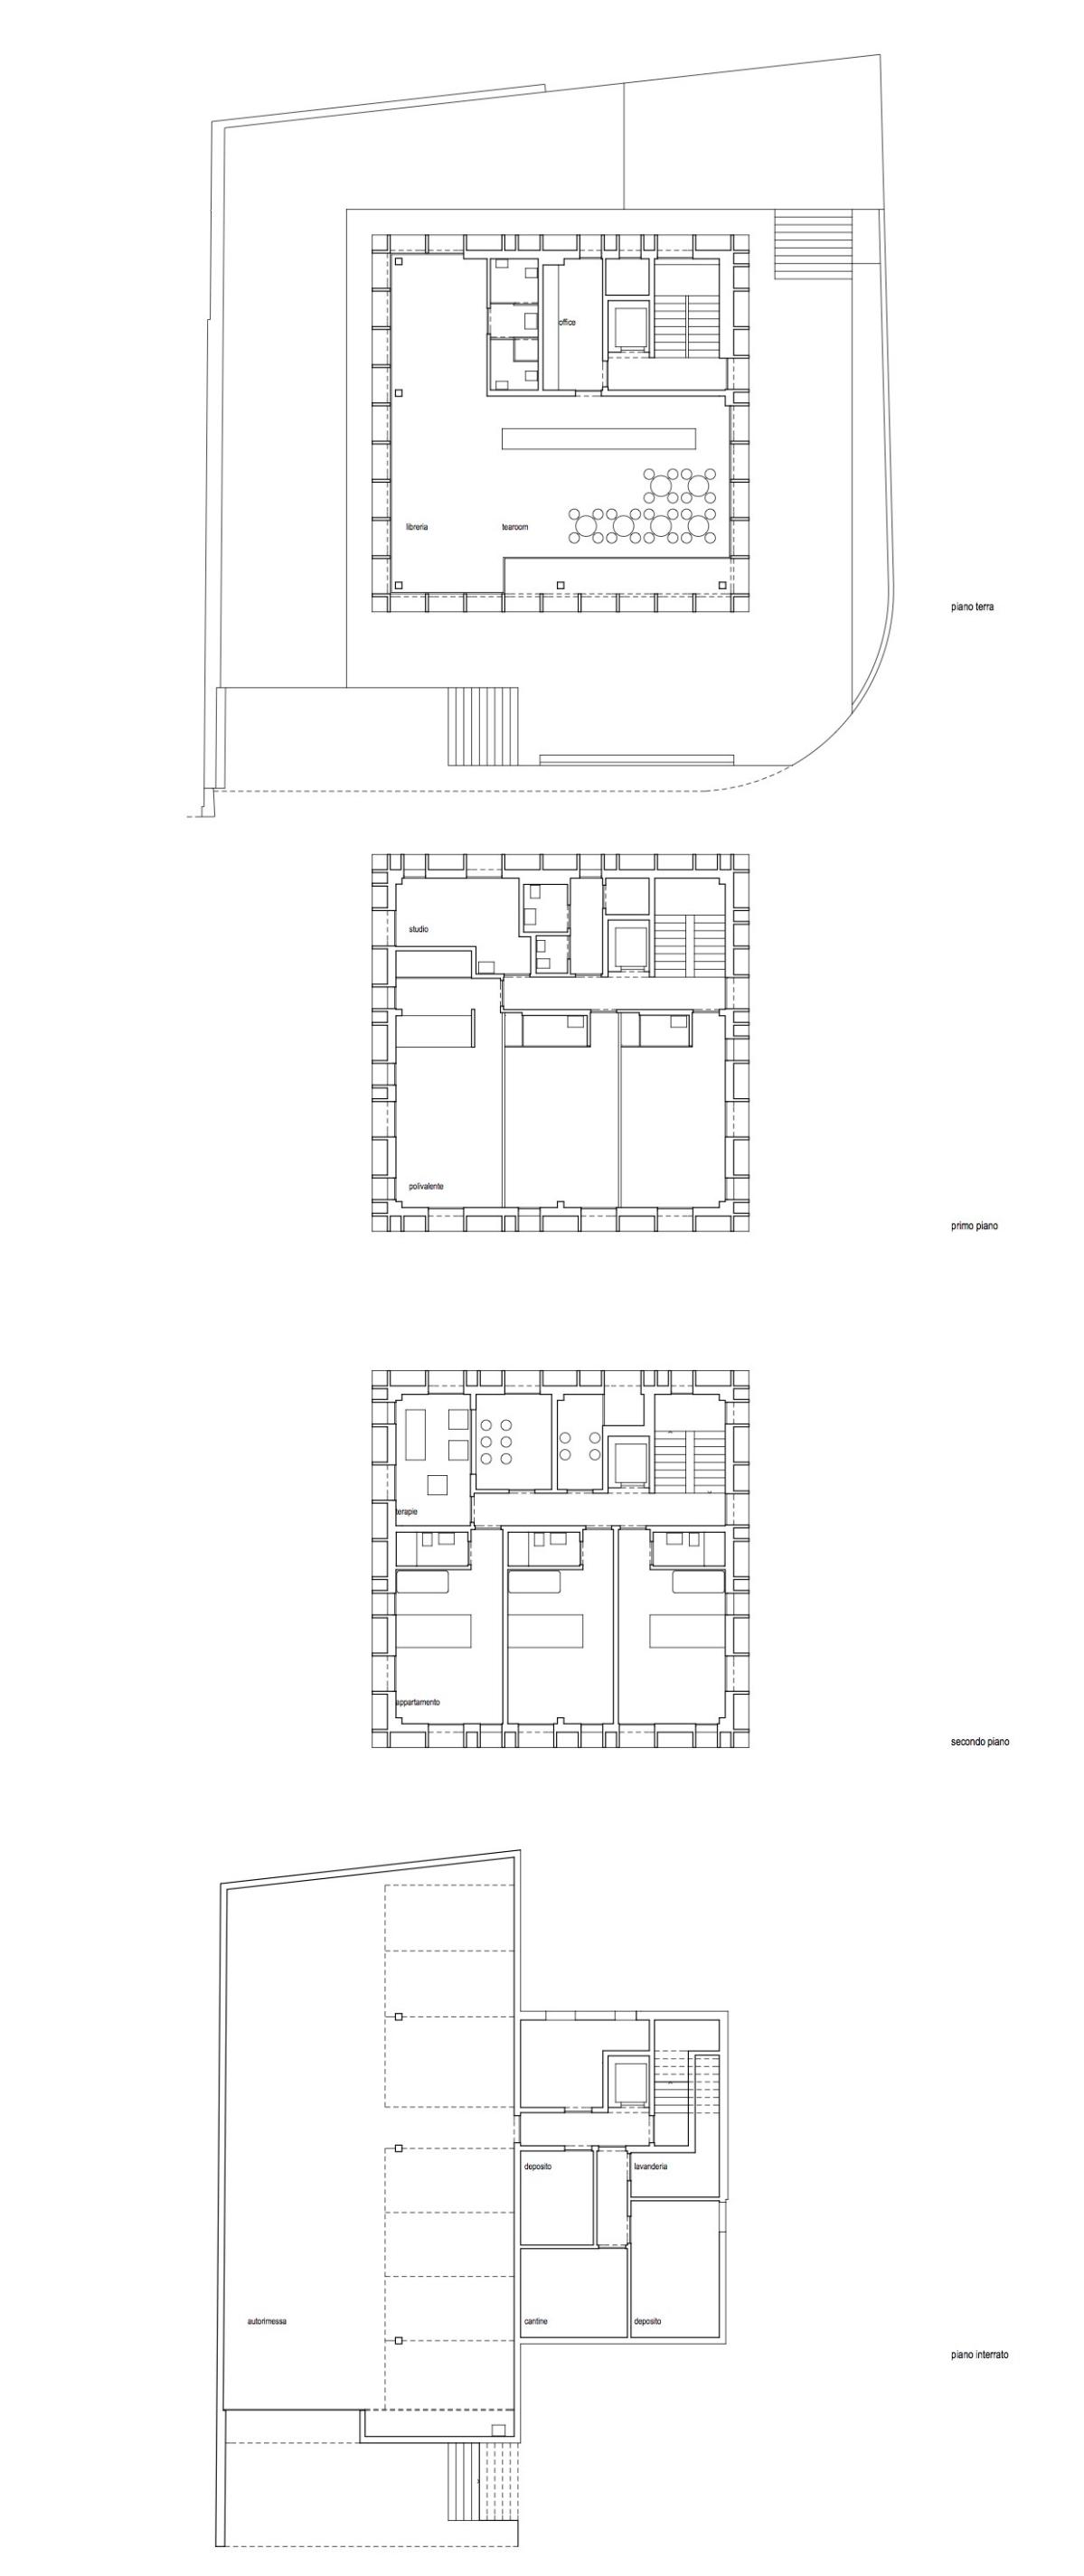 01-torre-dangolo-piante.jpg